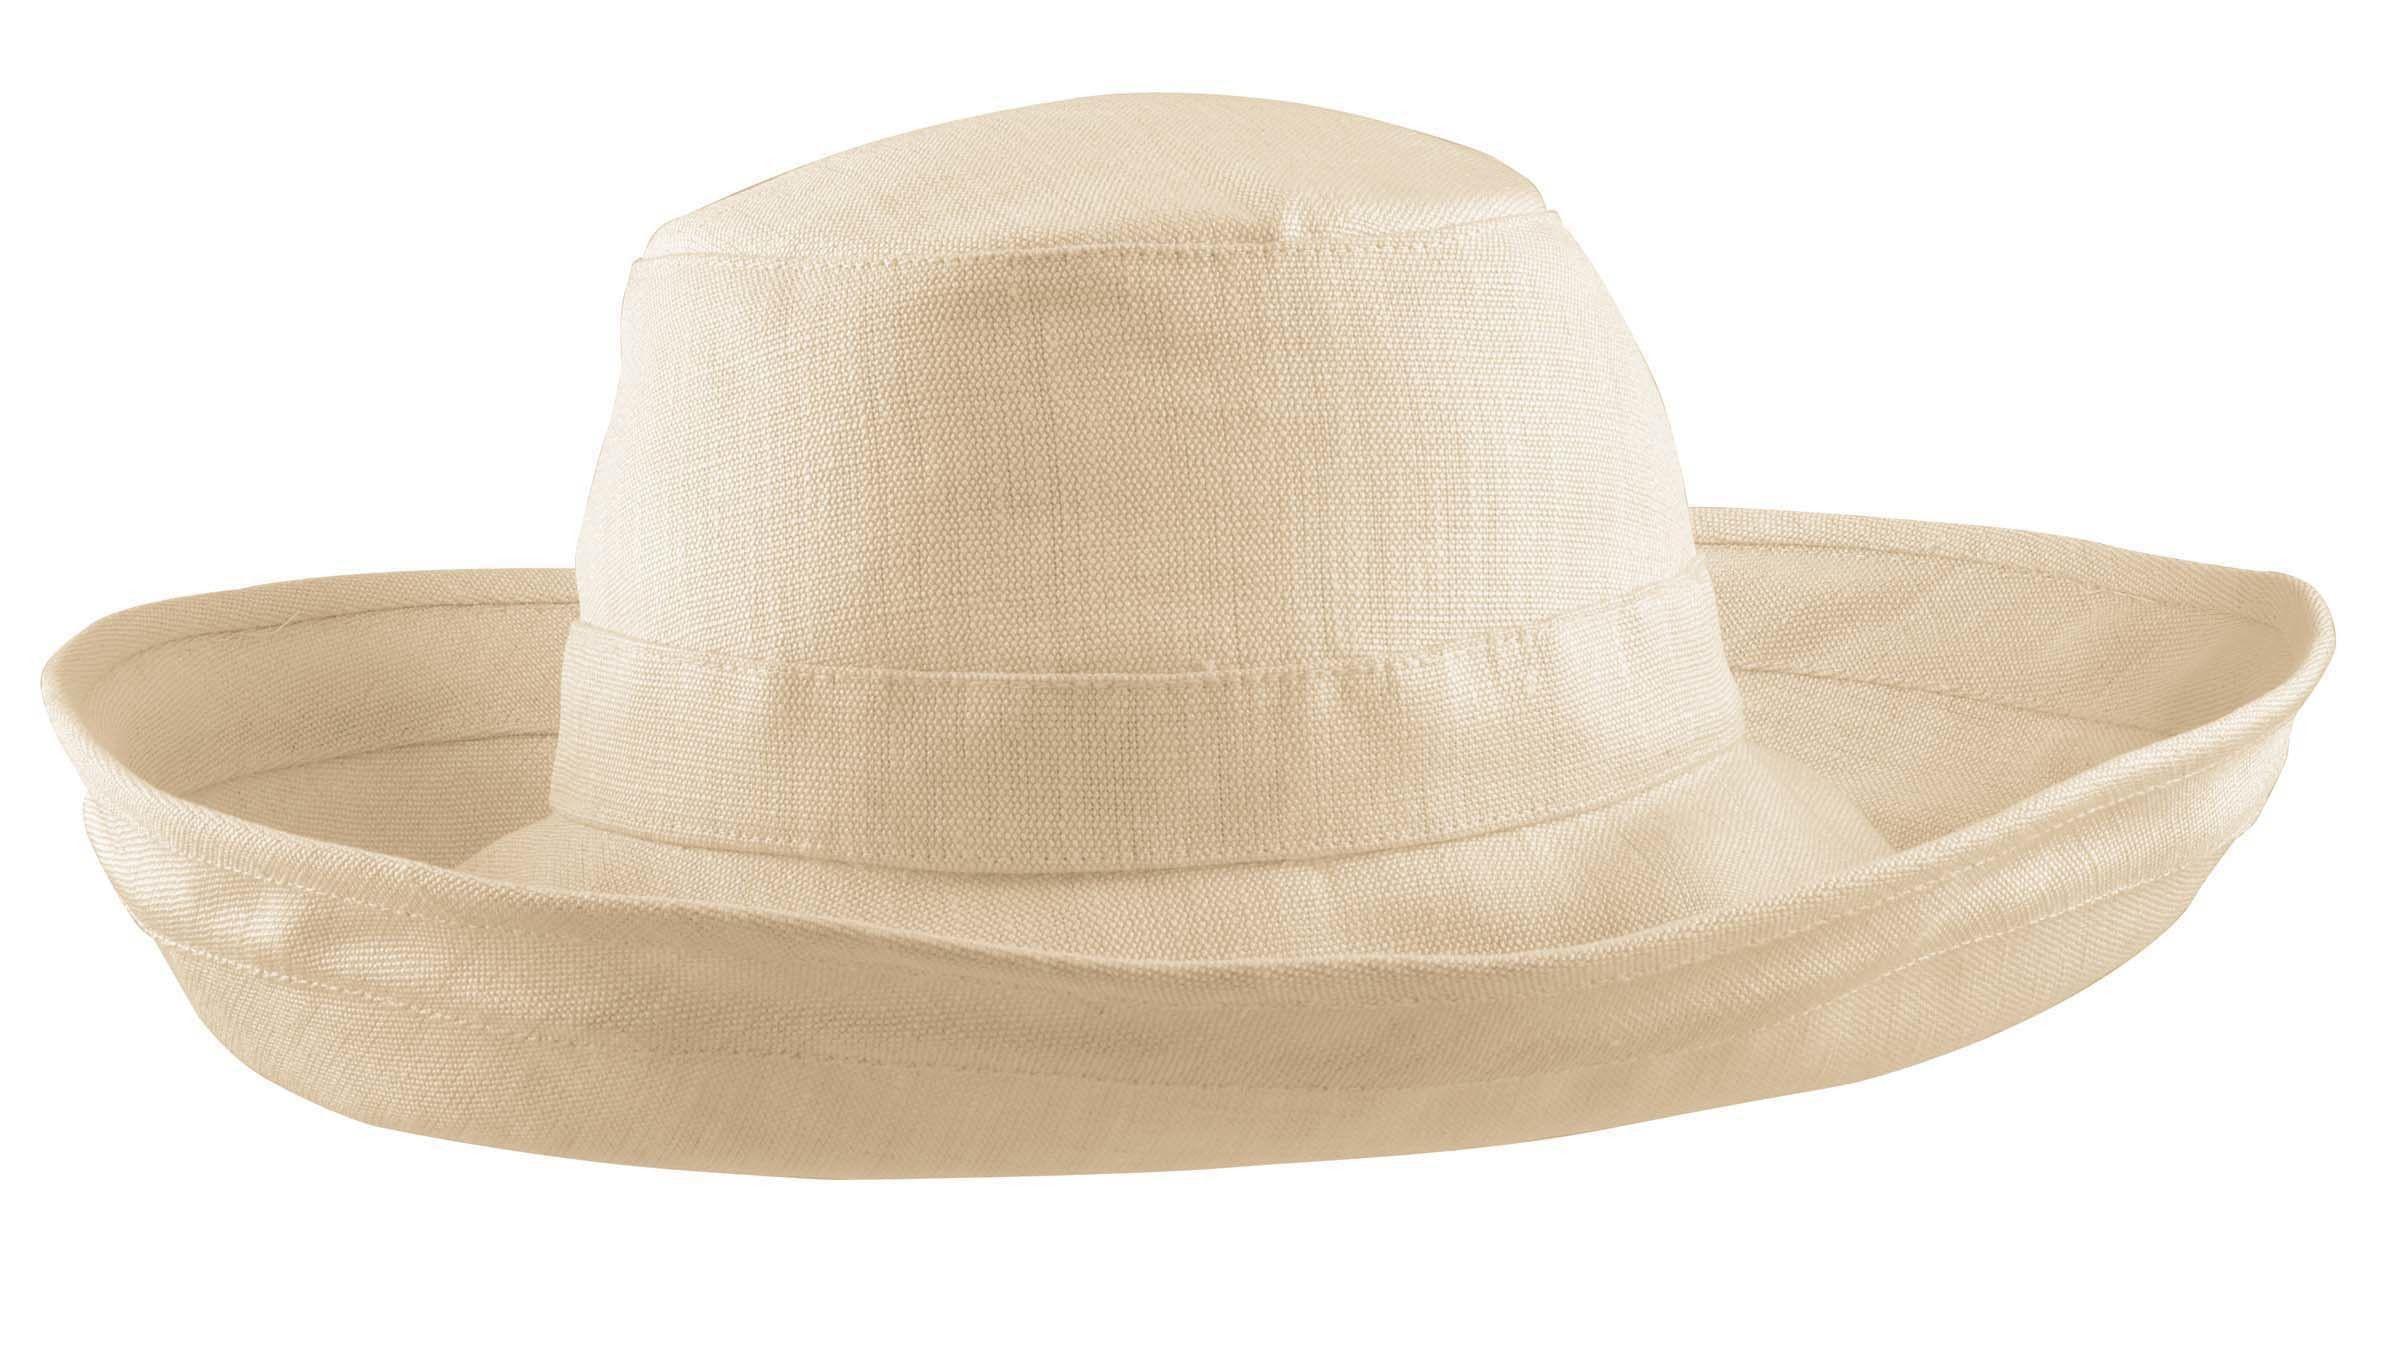 Tilley Women s TH8 Hemp 3 Inch Brim UPF 50+ Hat  71872ea8d62d